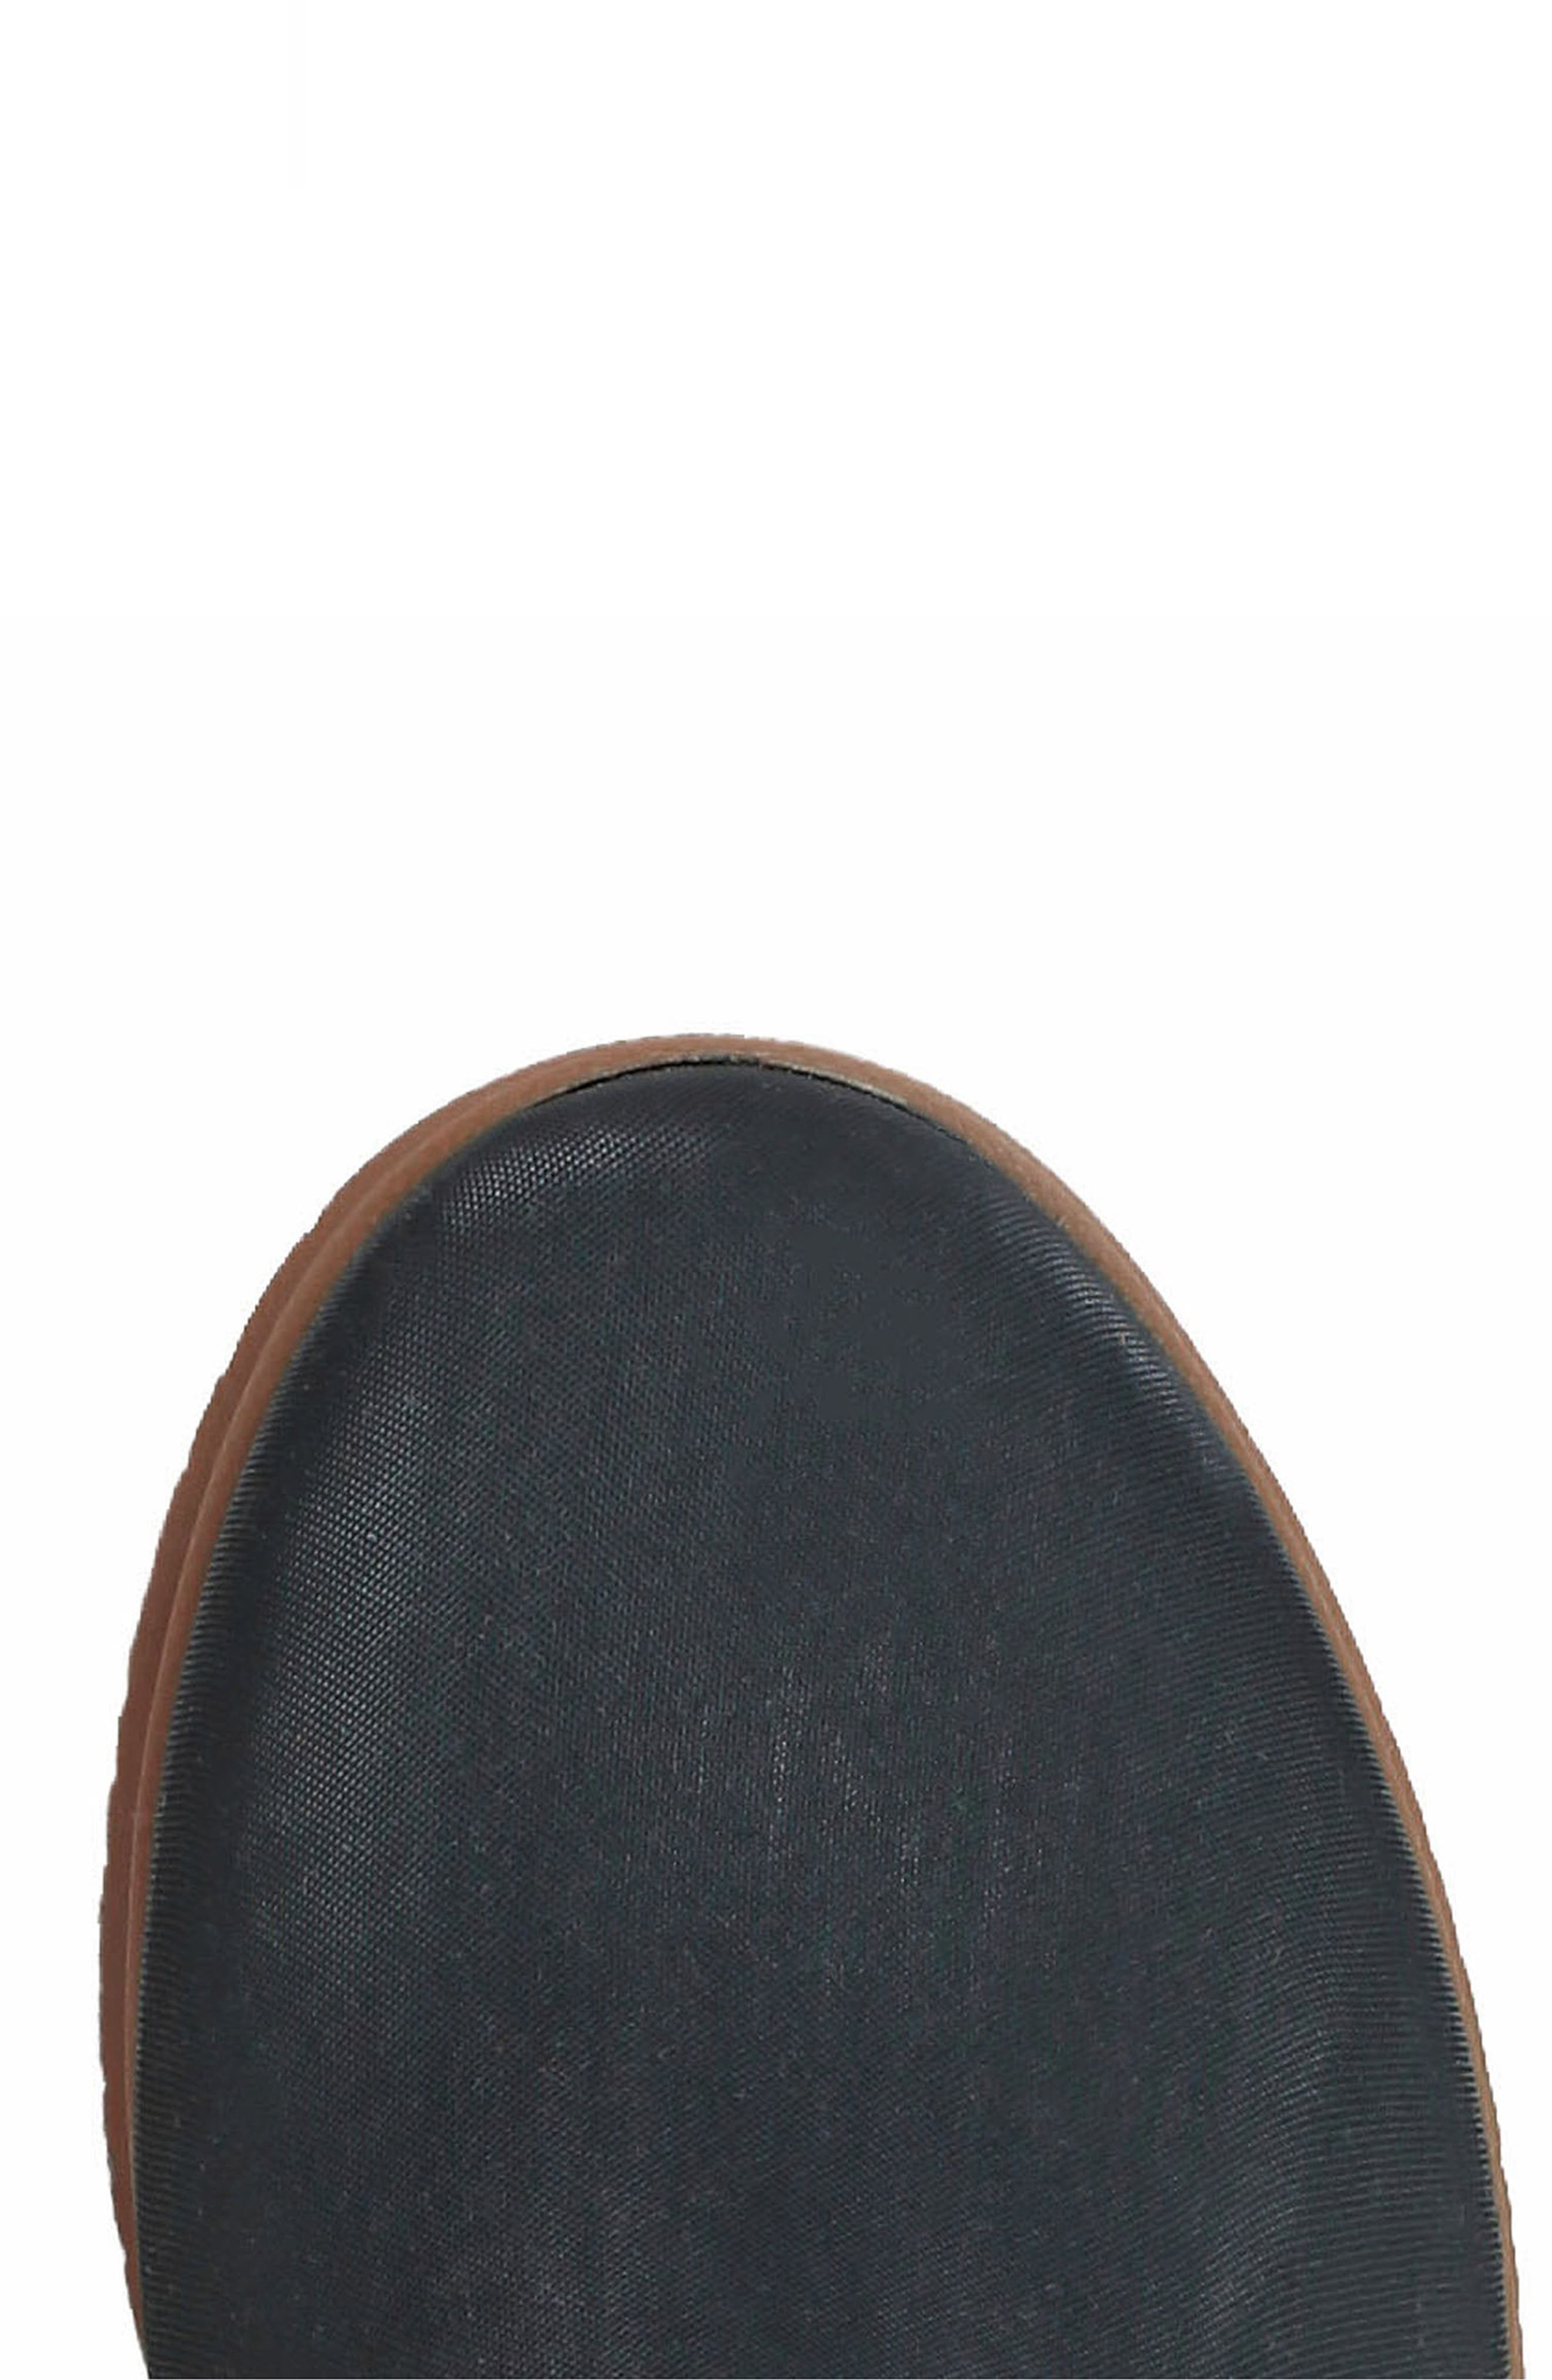 BOGS, Sweetpea Rain Boot, Alternate thumbnail 7, color, BLACK RUBBER